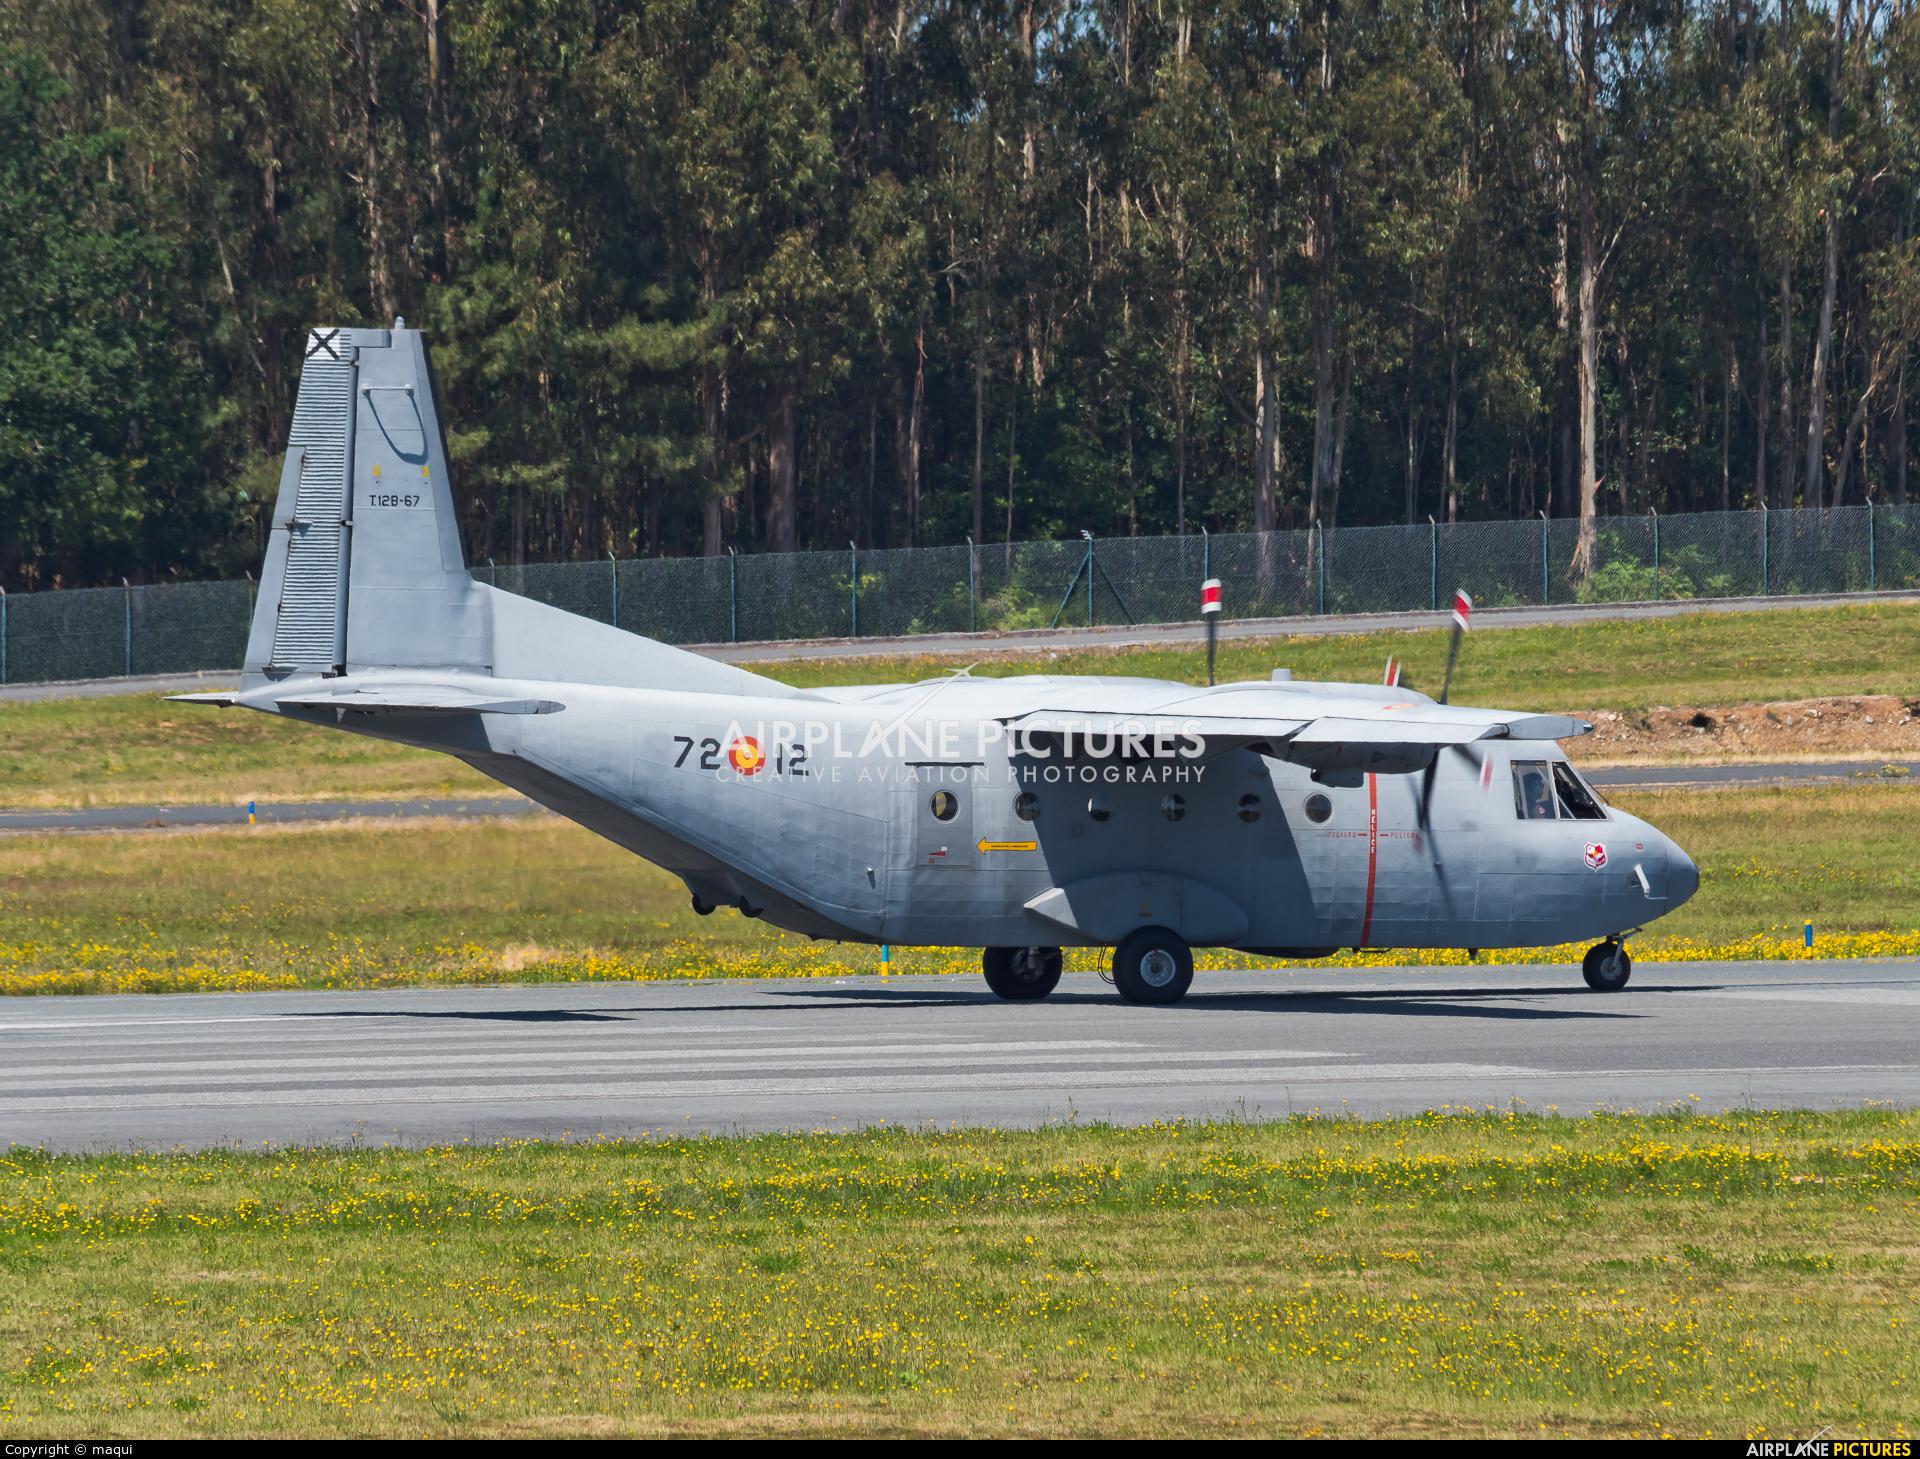 Spain - Air Force T.12B-67 aircraft at Santiago de Compostela